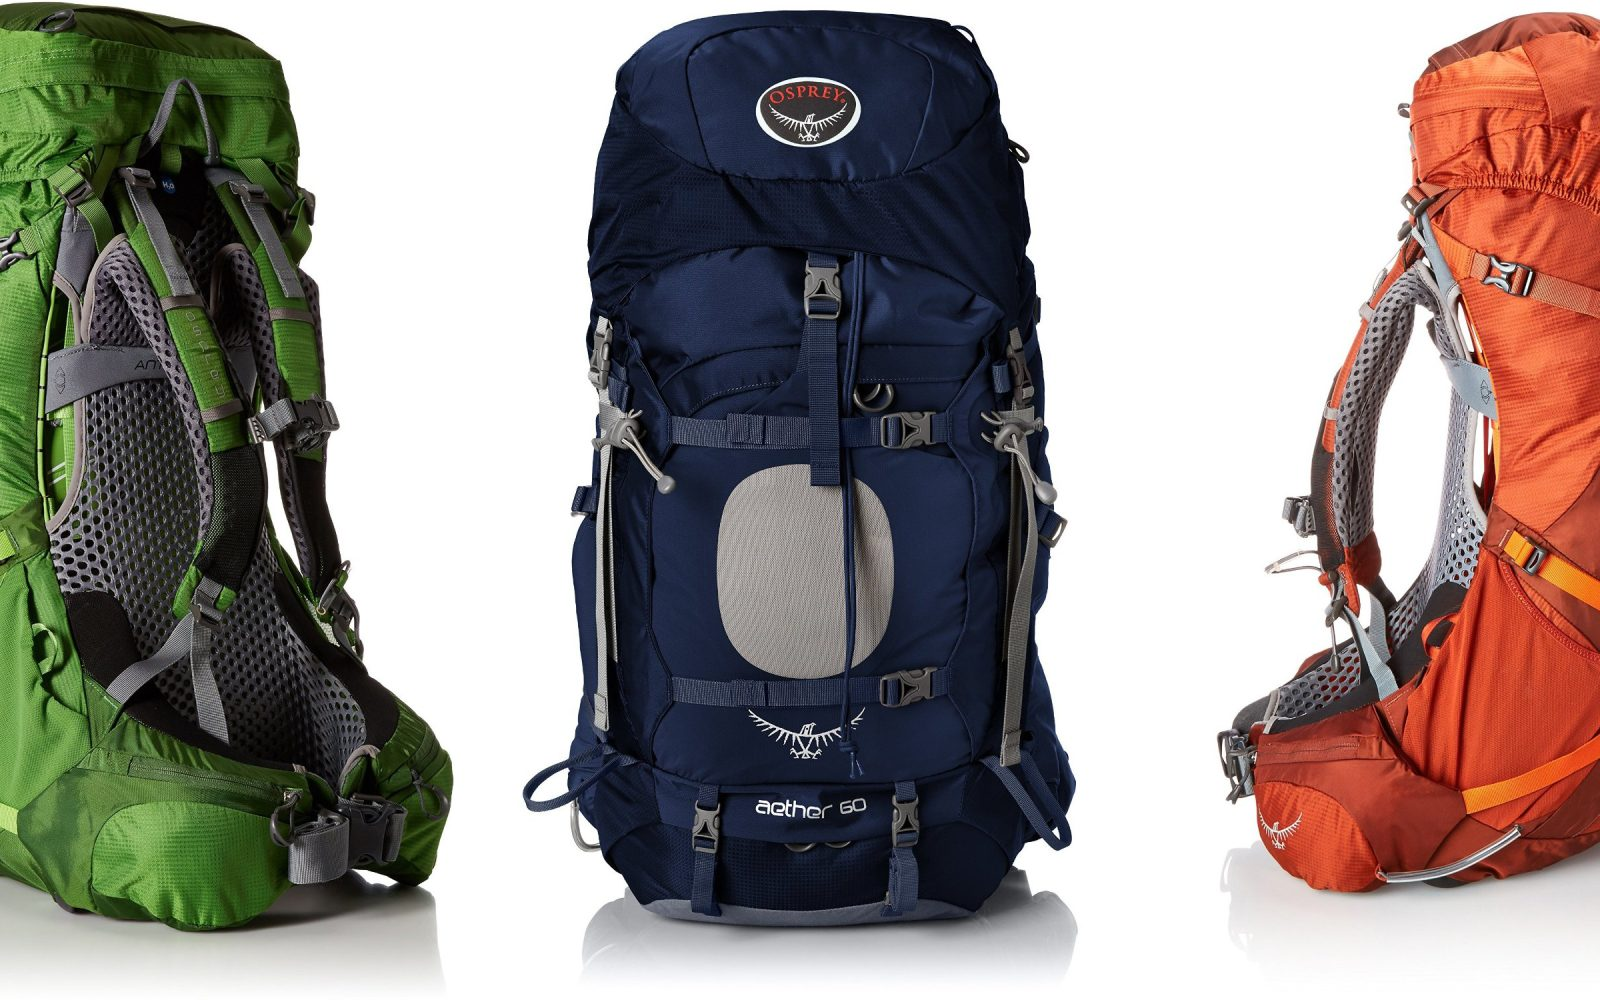 Sports Fitness  Osprey hiking backpacks from  173 (Orig.  230+) 3801c5ea0b296